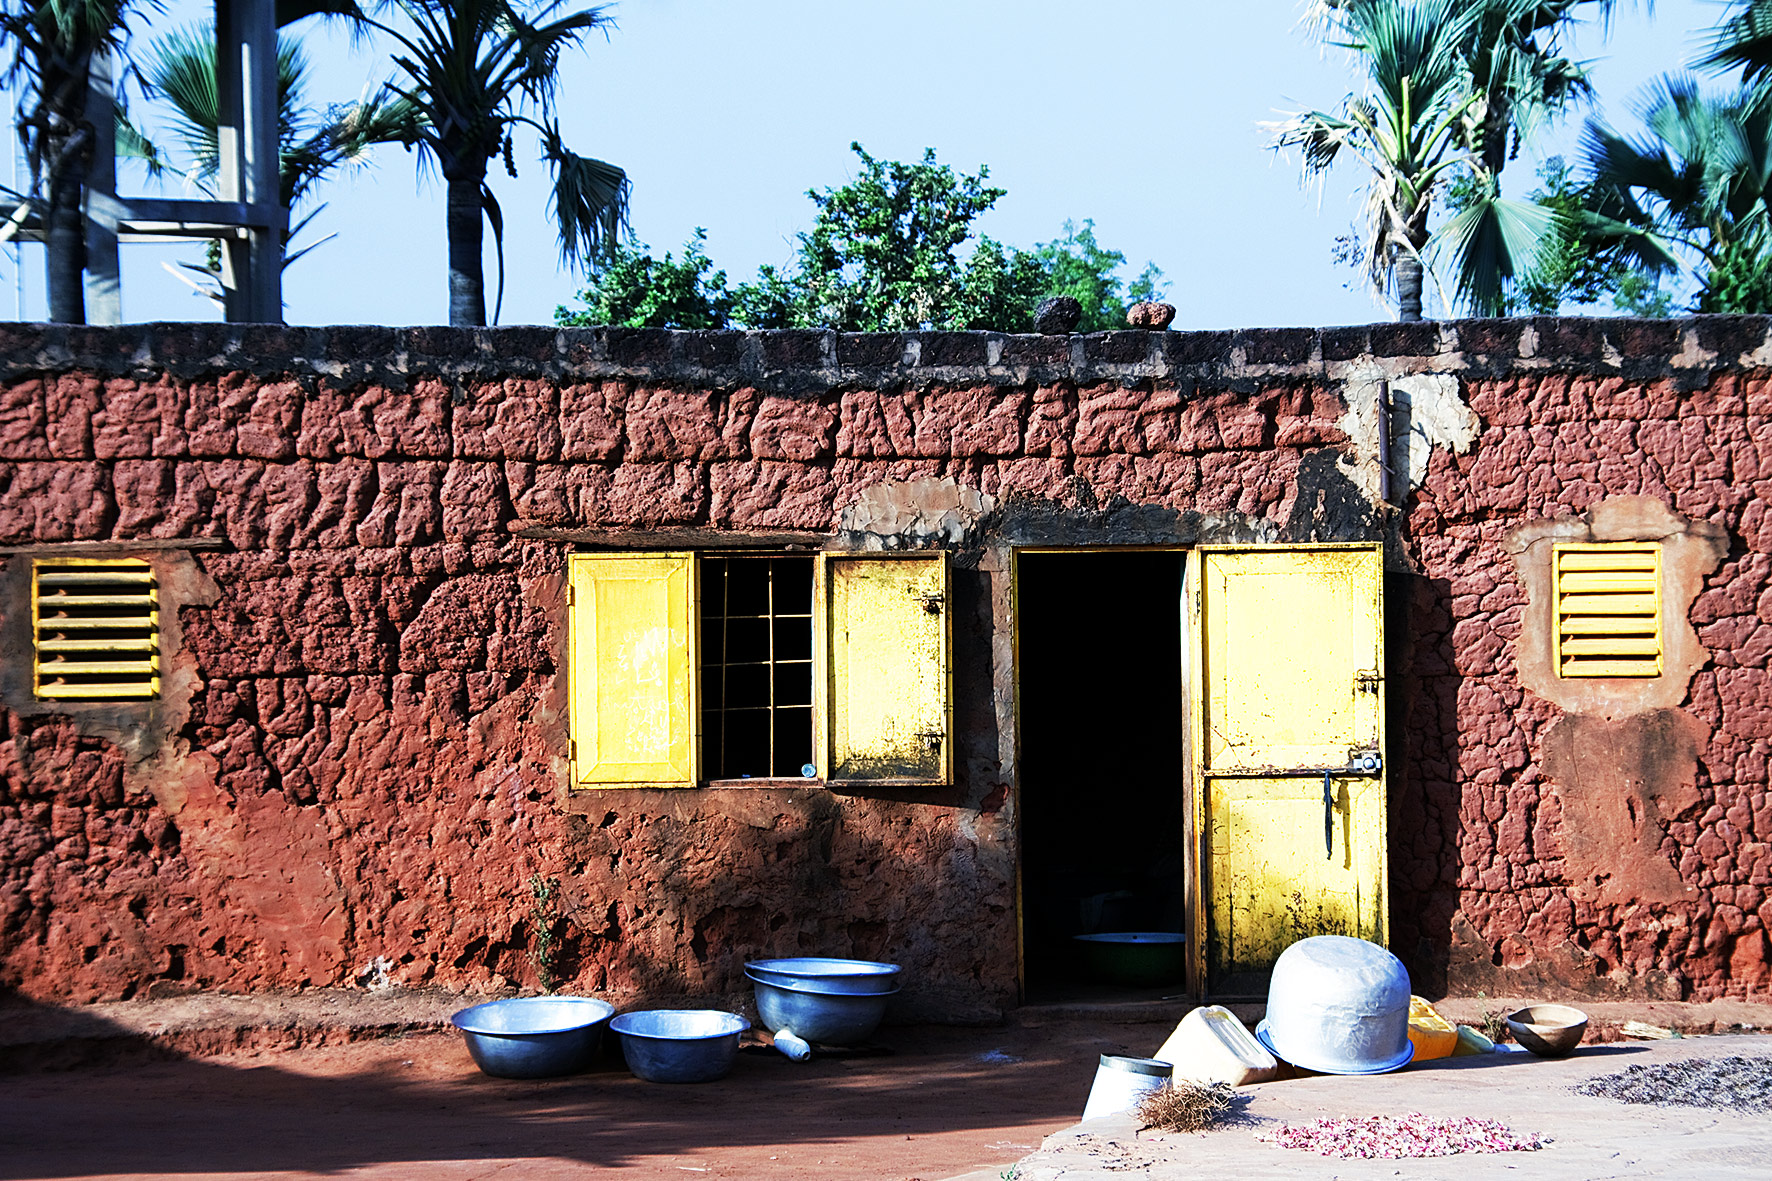 Burkina Faso, Bobo-Dioulasso. 2010